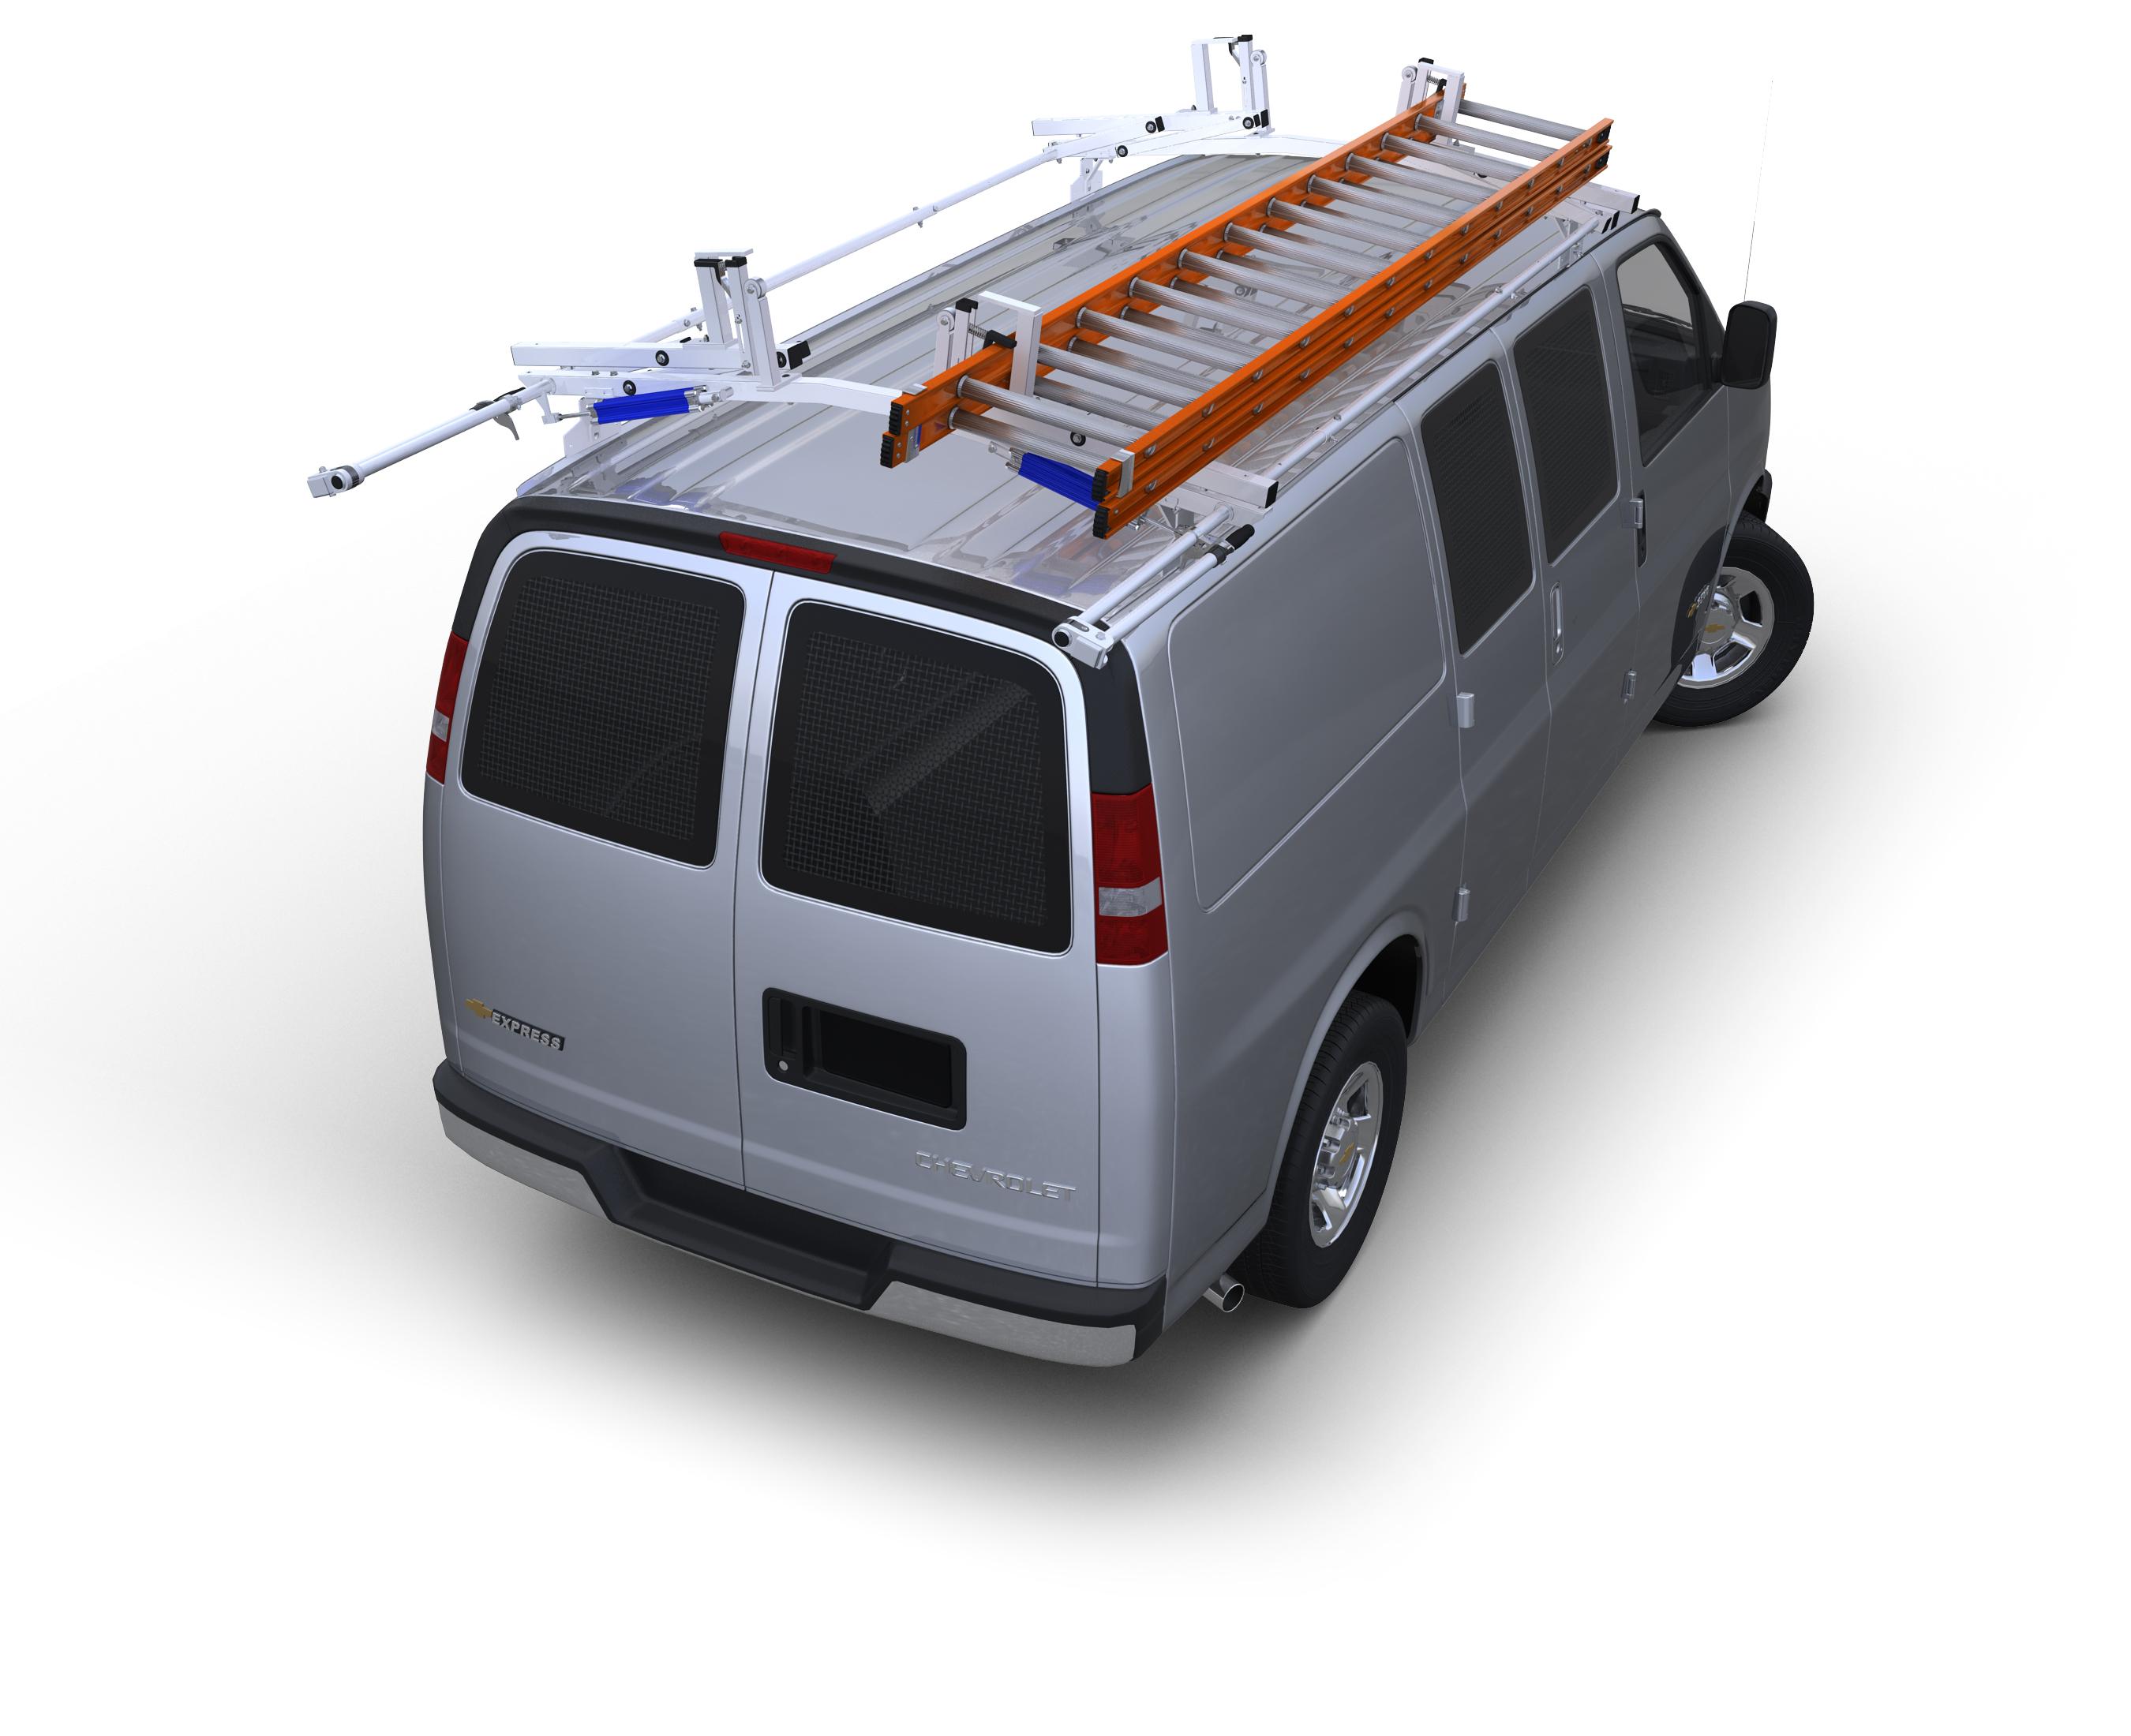 Jet Rack 174 Step Ladder Storage System